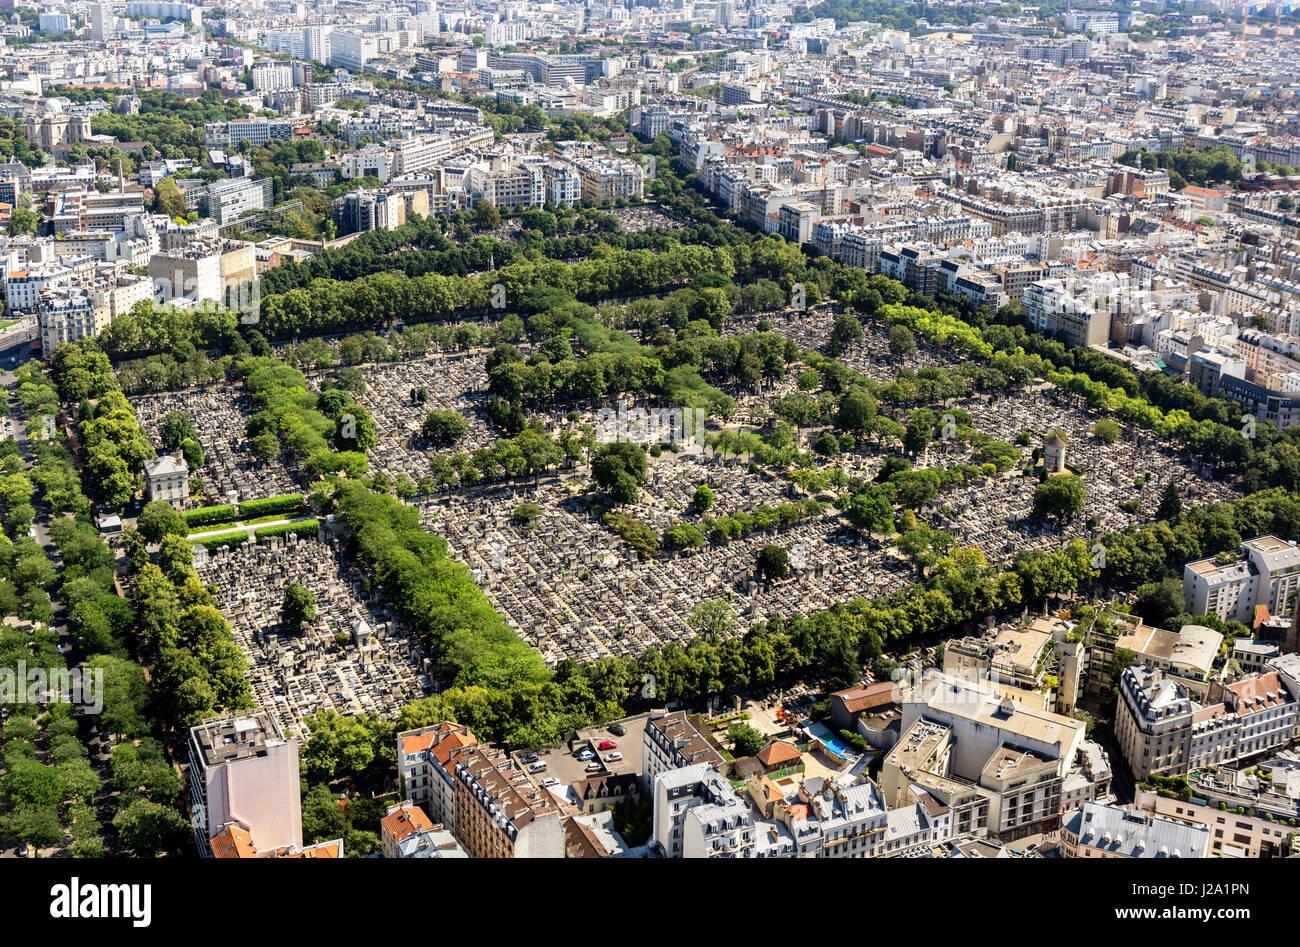 Montparnasse Cemetery (La Cimetière du Montparnasse) from the observation deck at the top of the Tour Montparnasse, - Stock Image